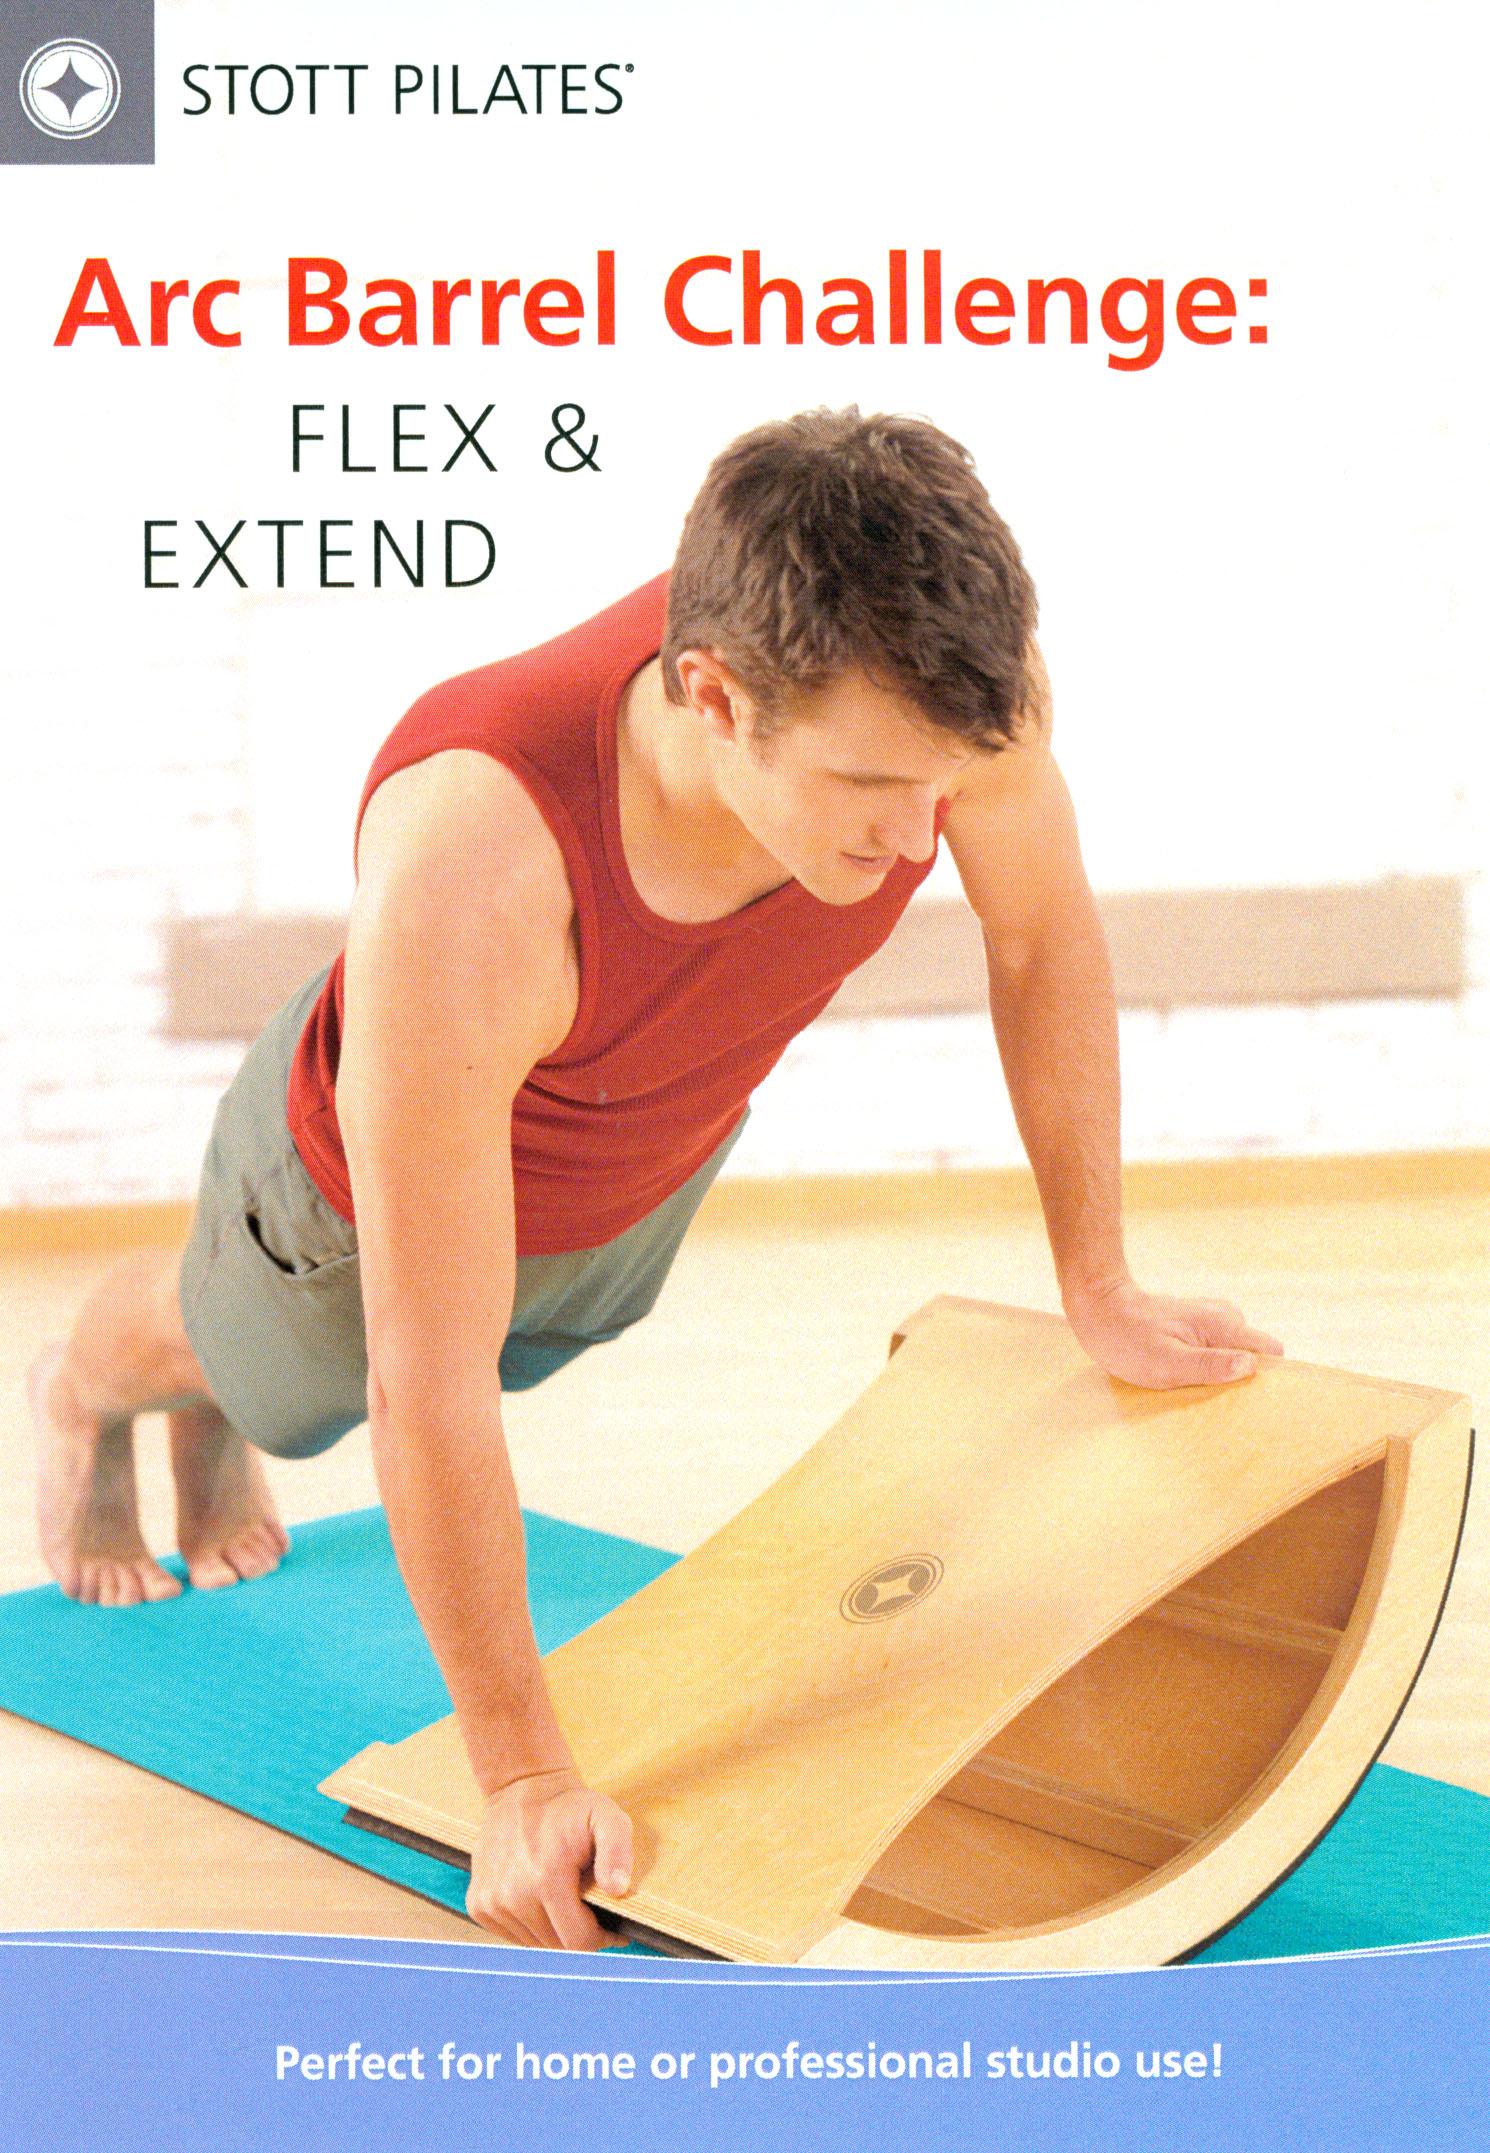 Stott Pilates: Arc Barrel Challenge - Flex & Extend